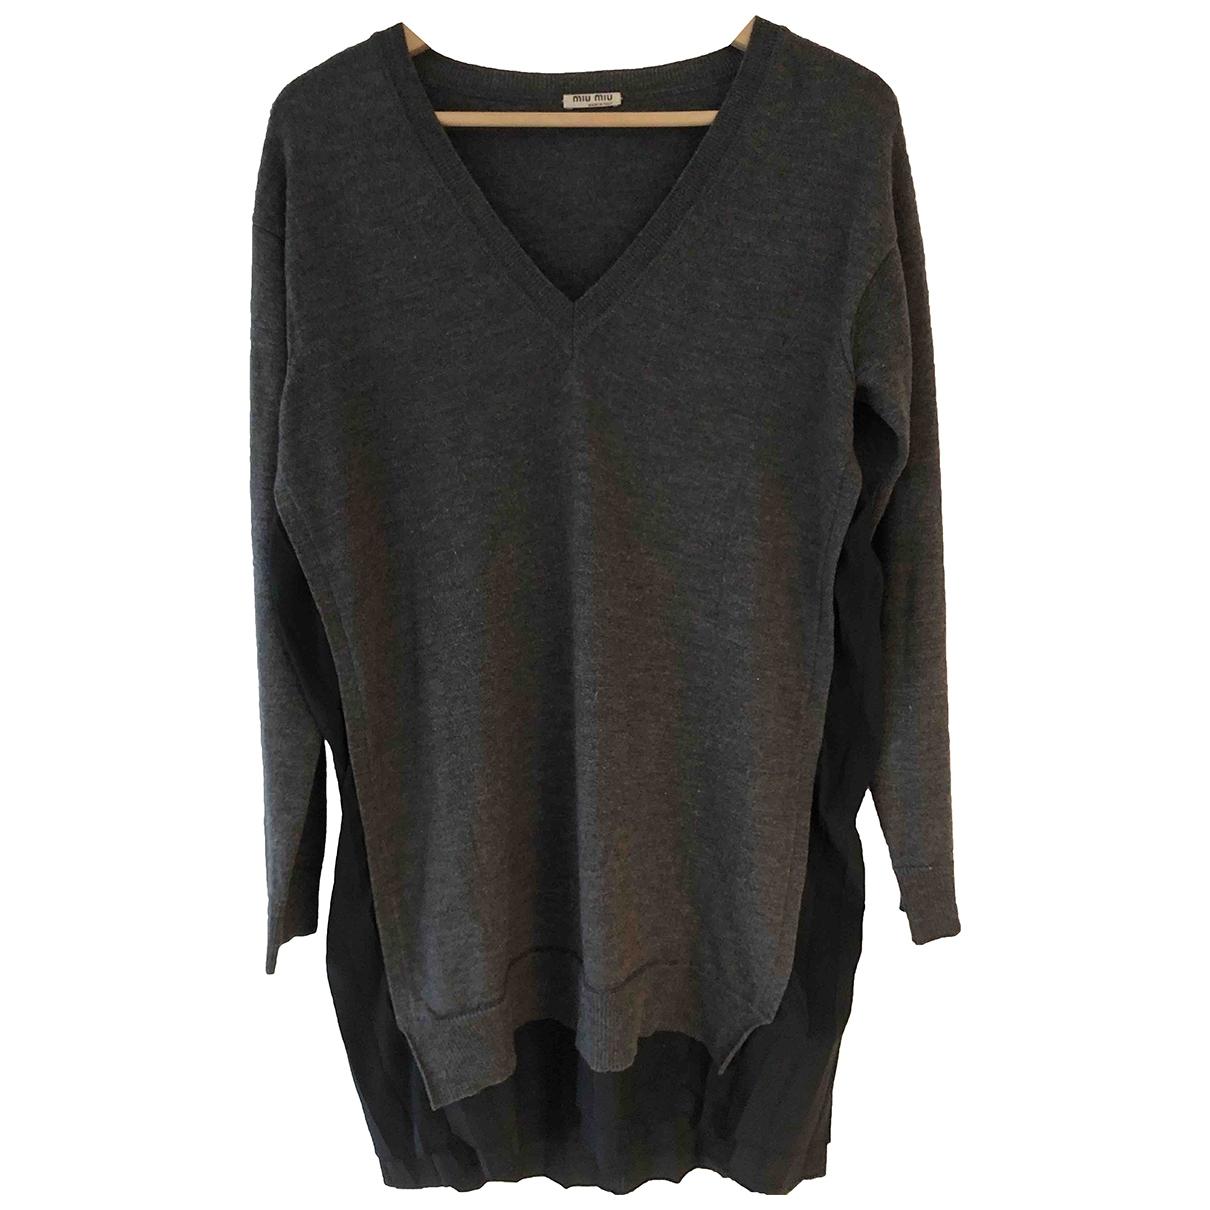 Miu Miu \N Anthracite Wool Knitwear for Women 42 IT